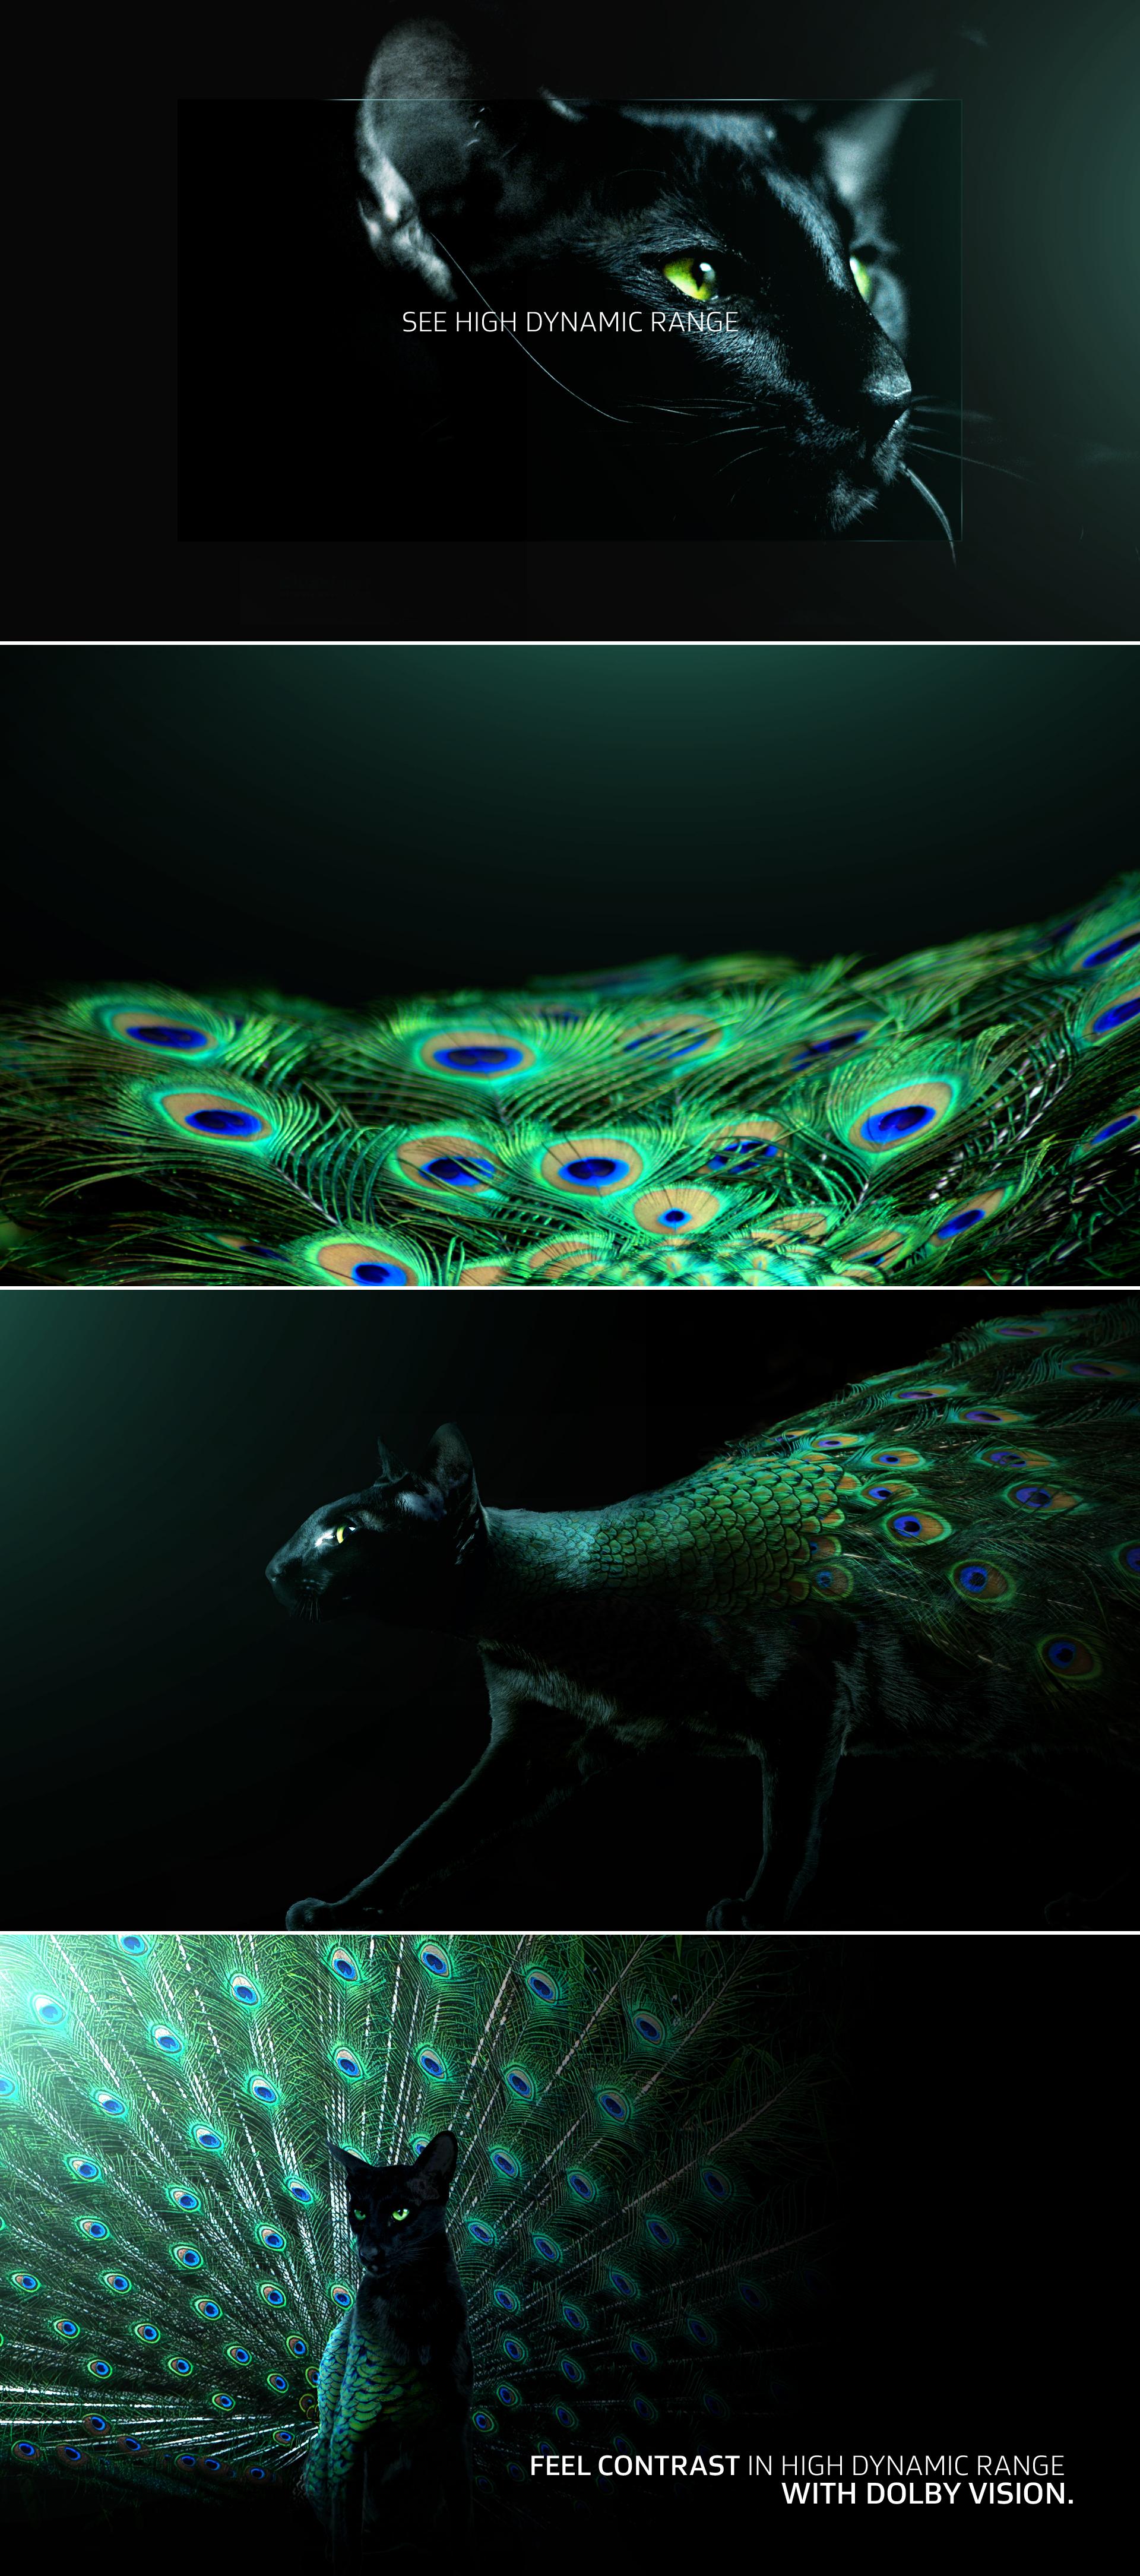 063017_Dolby_LG_PeacockC_S01.jpg